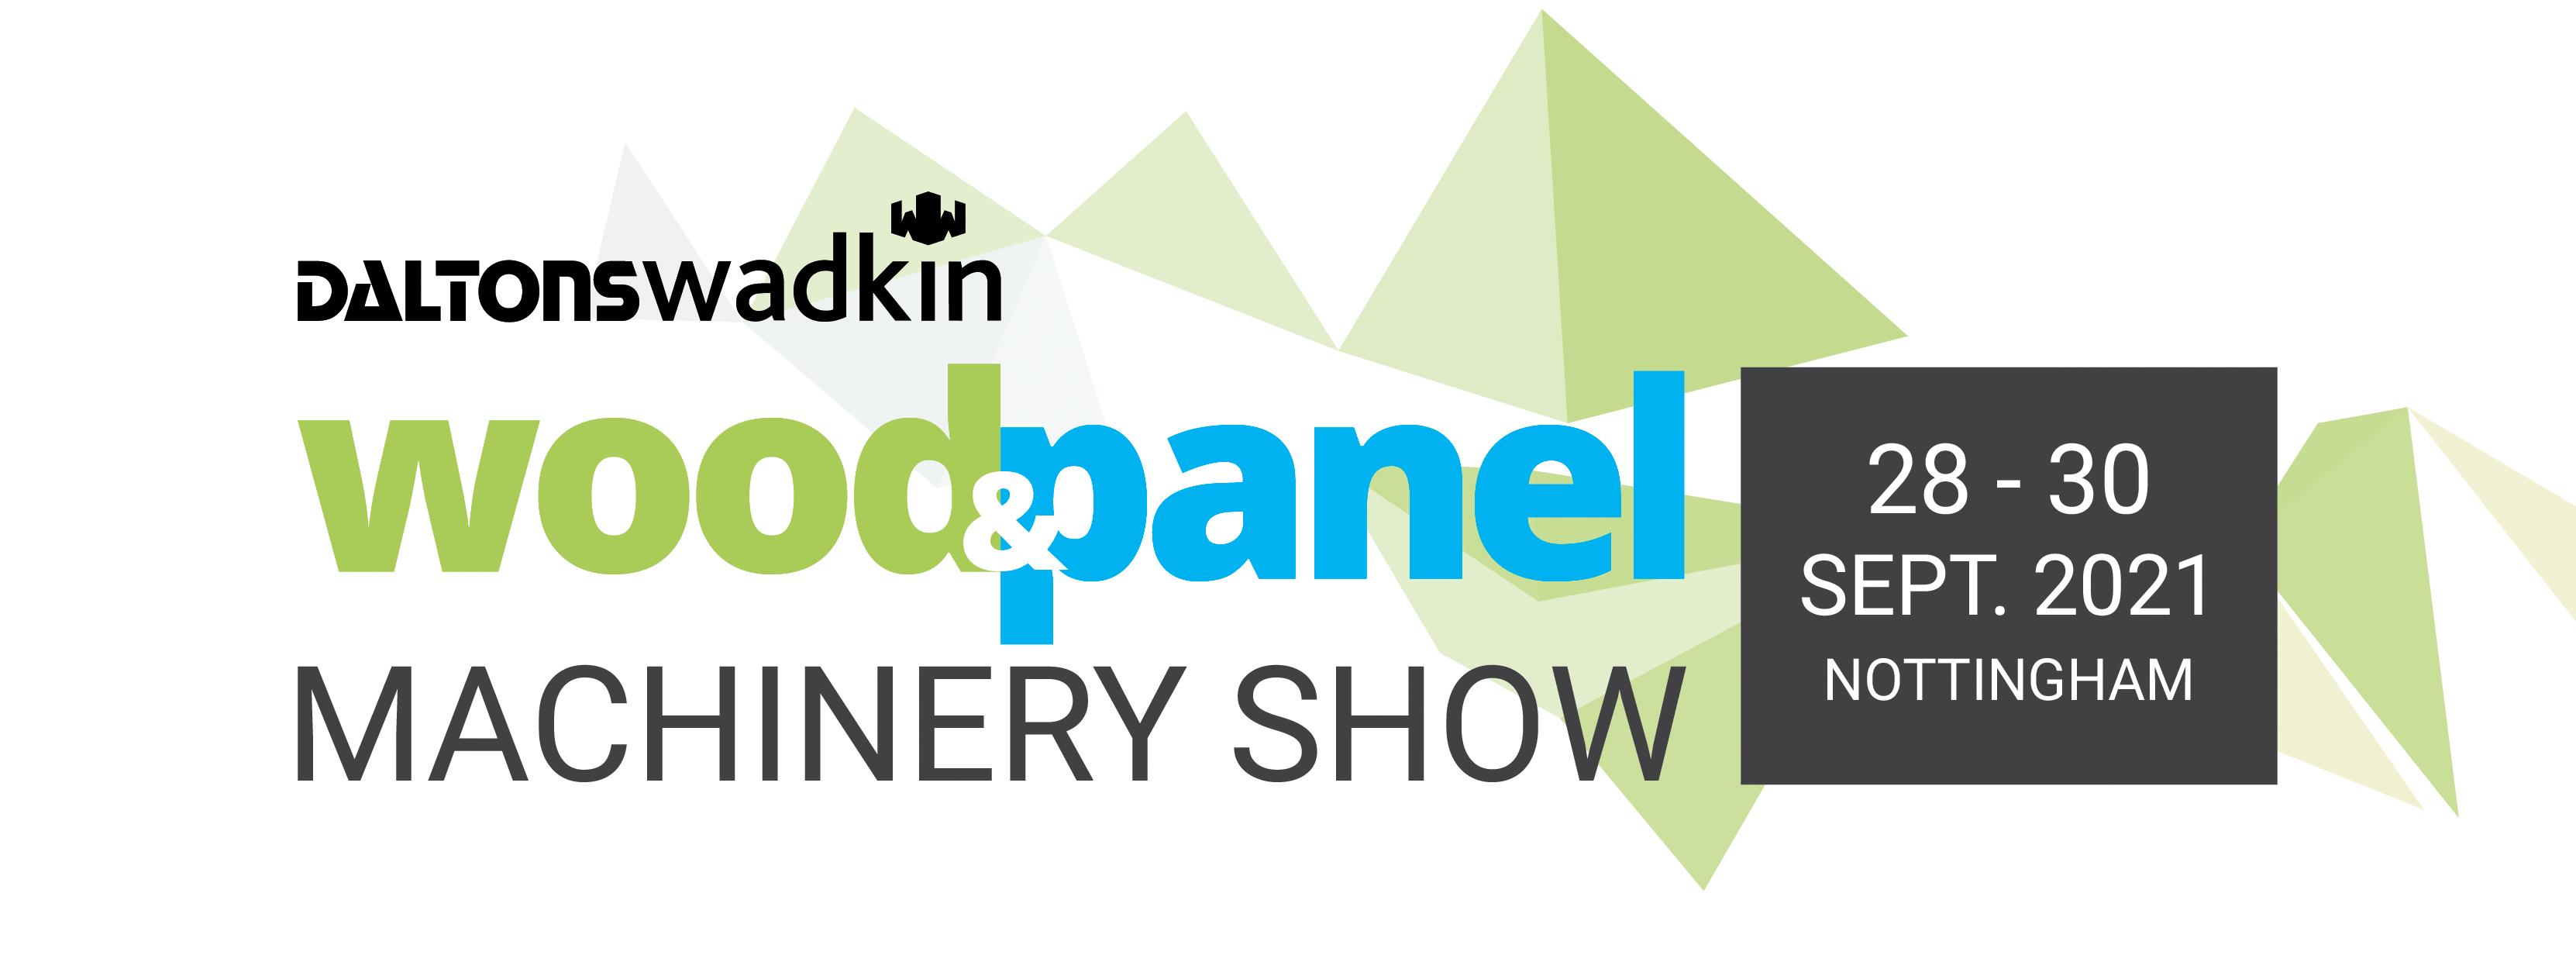 Daltons Wadkin Wood & Panel Machinery Show – September 2021